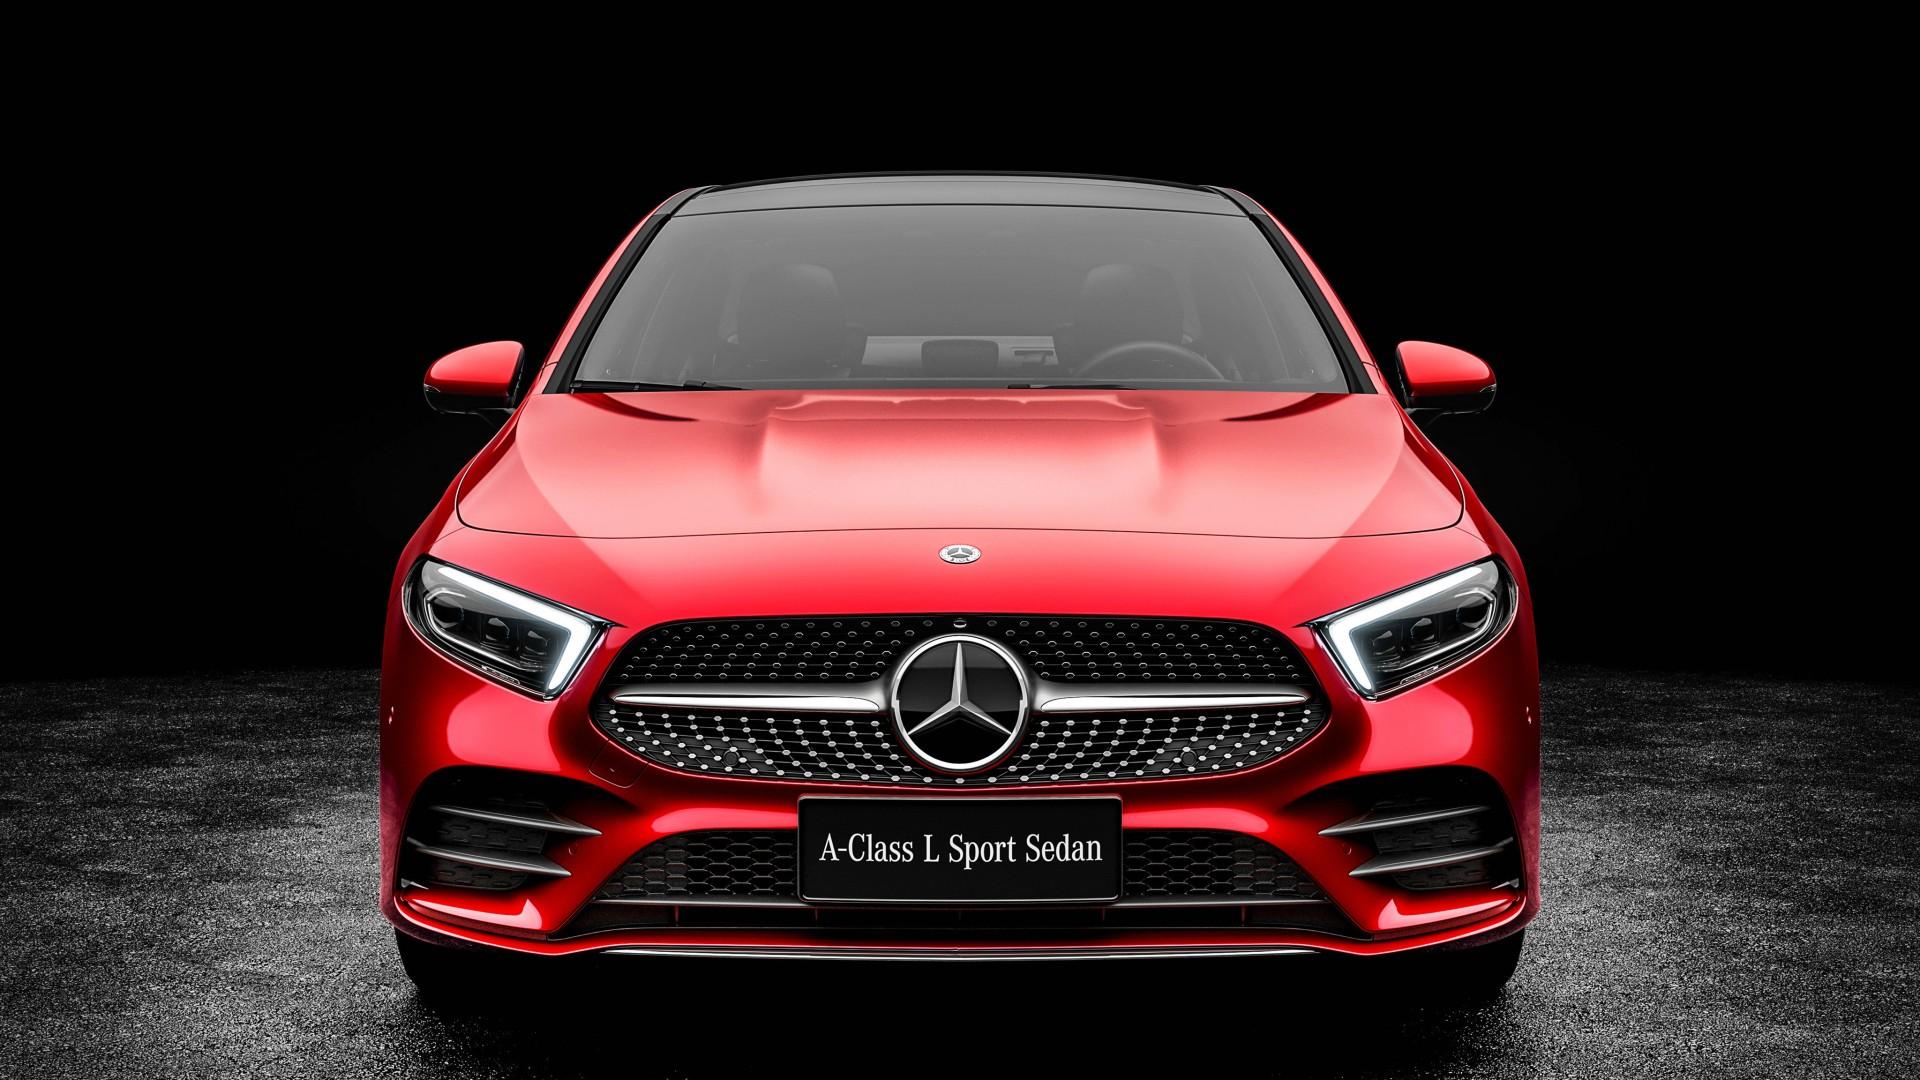 Www Hummer Limousine Car Wallpapers Com 2019 Mercedes Benz A200 L Sport Sedan 4k 3 Wallpaper Hd